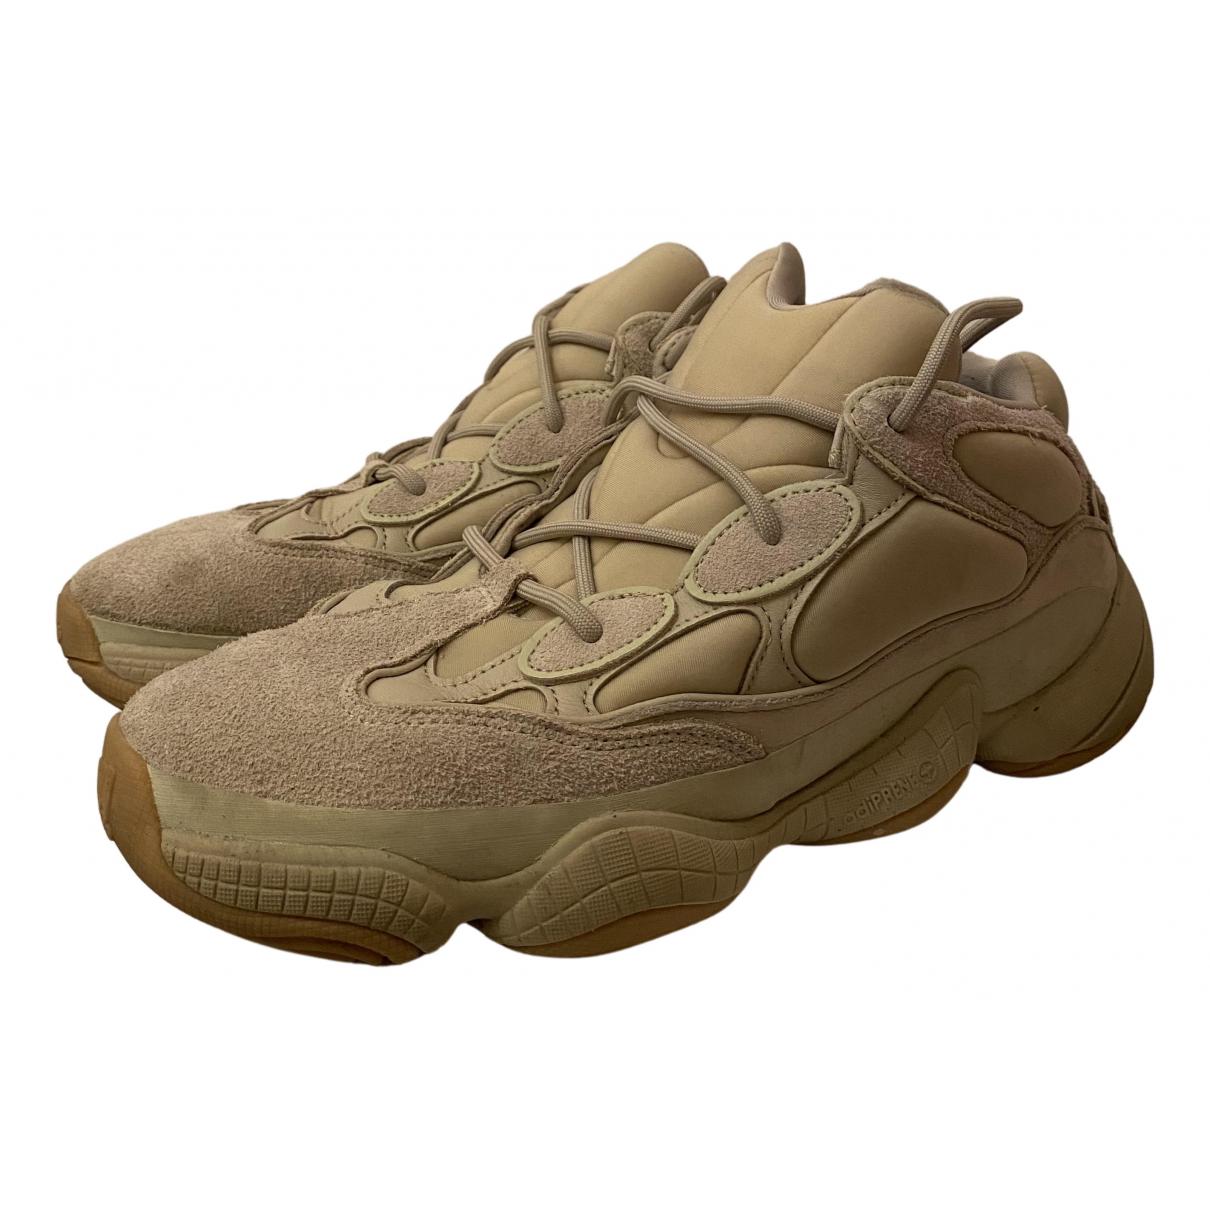 Yeezy X Adidas - Baskets 500 pour homme en suede - kaki